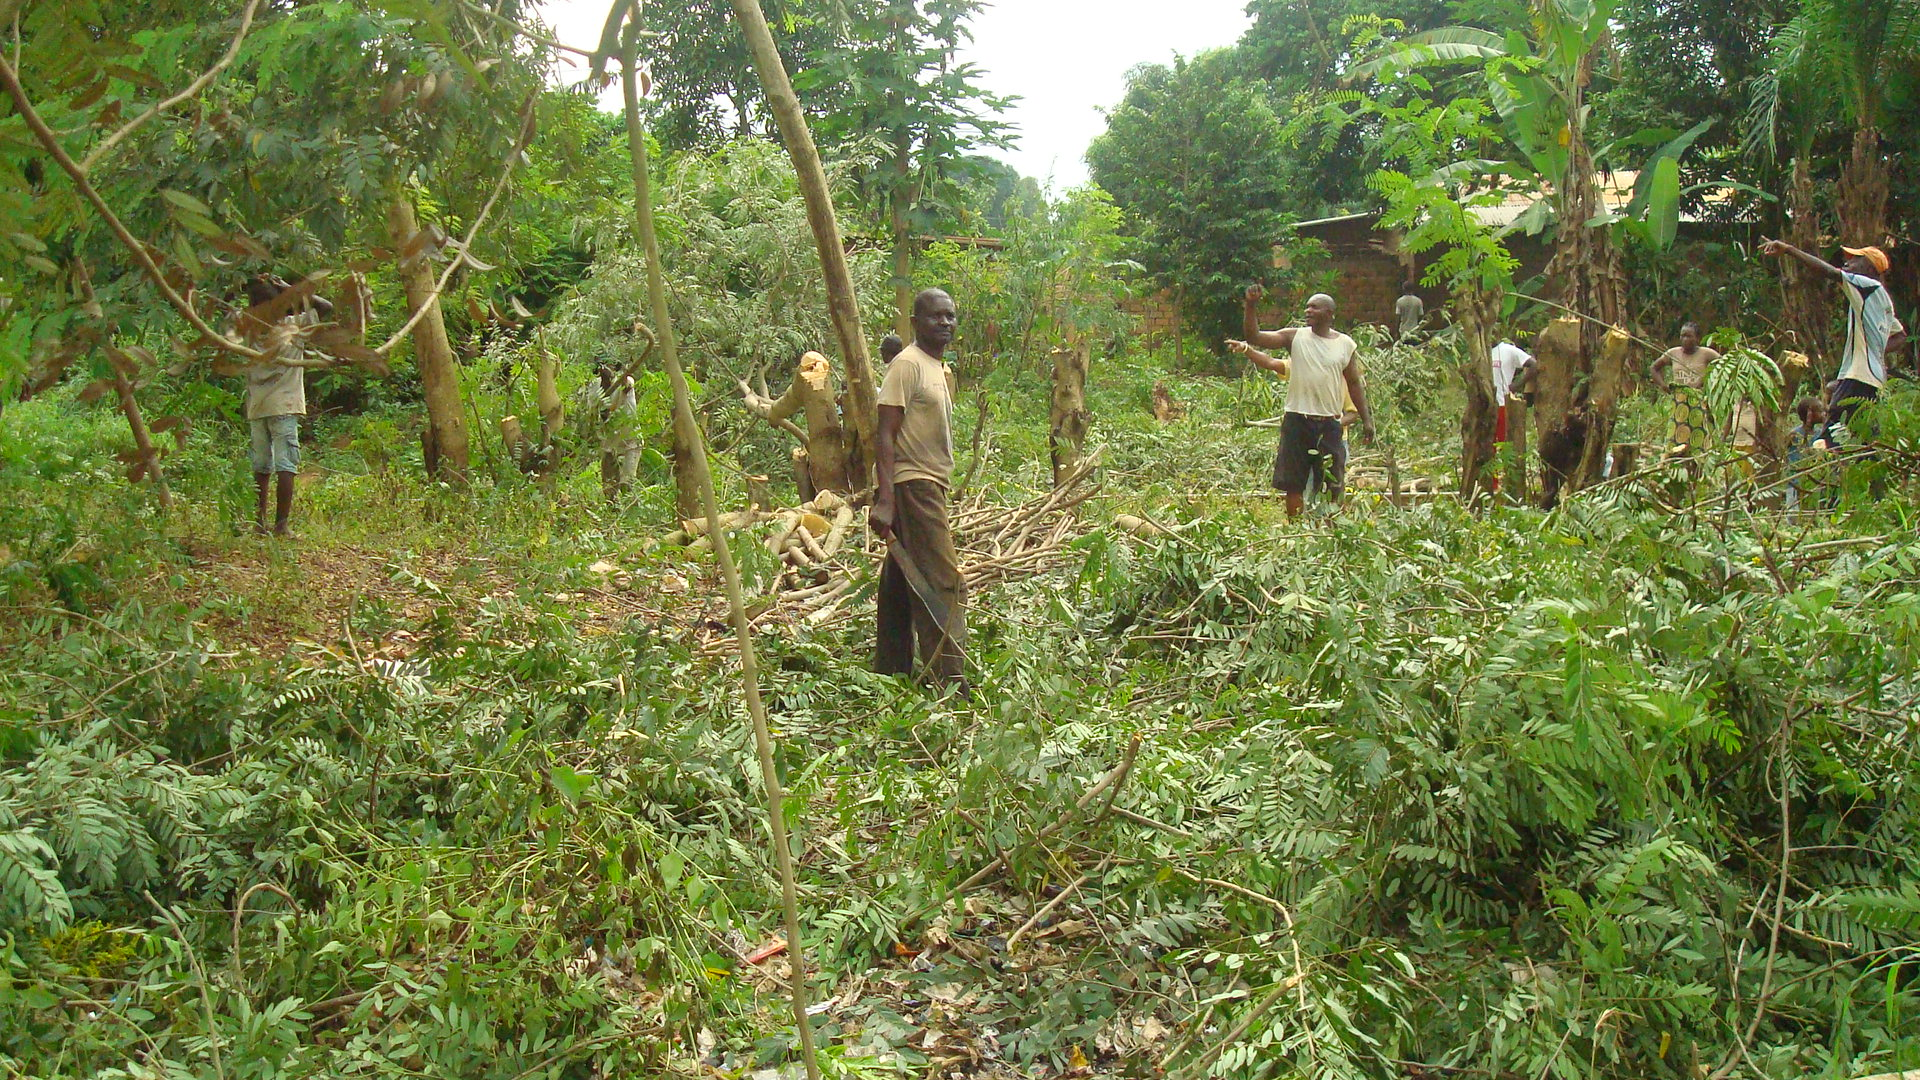 assainissement du milieu environnemental, Nkayi 2021 pcpacongo